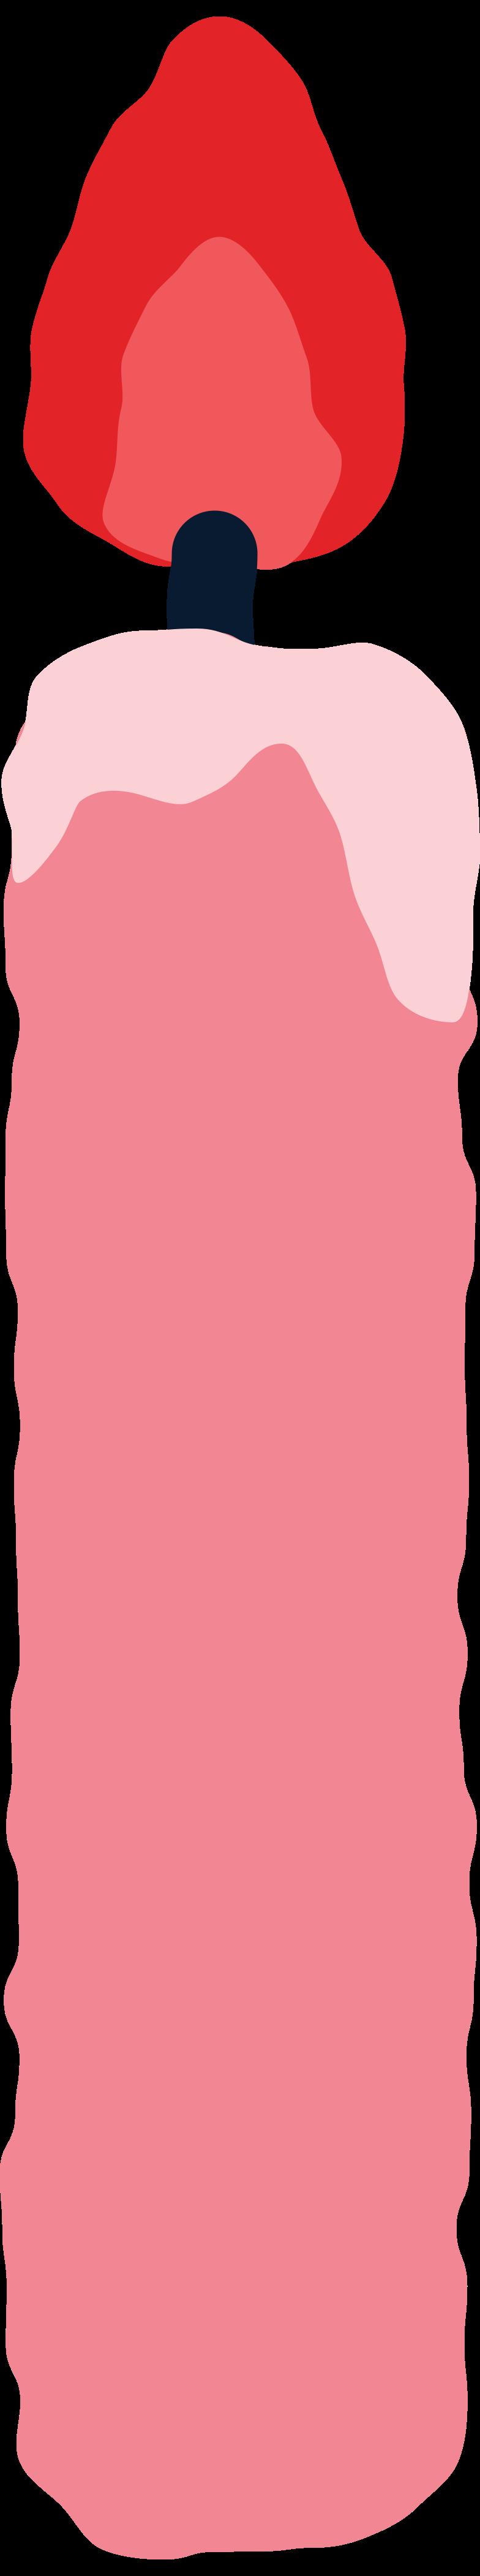 slim candle Clipart illustration in PNG, SVG